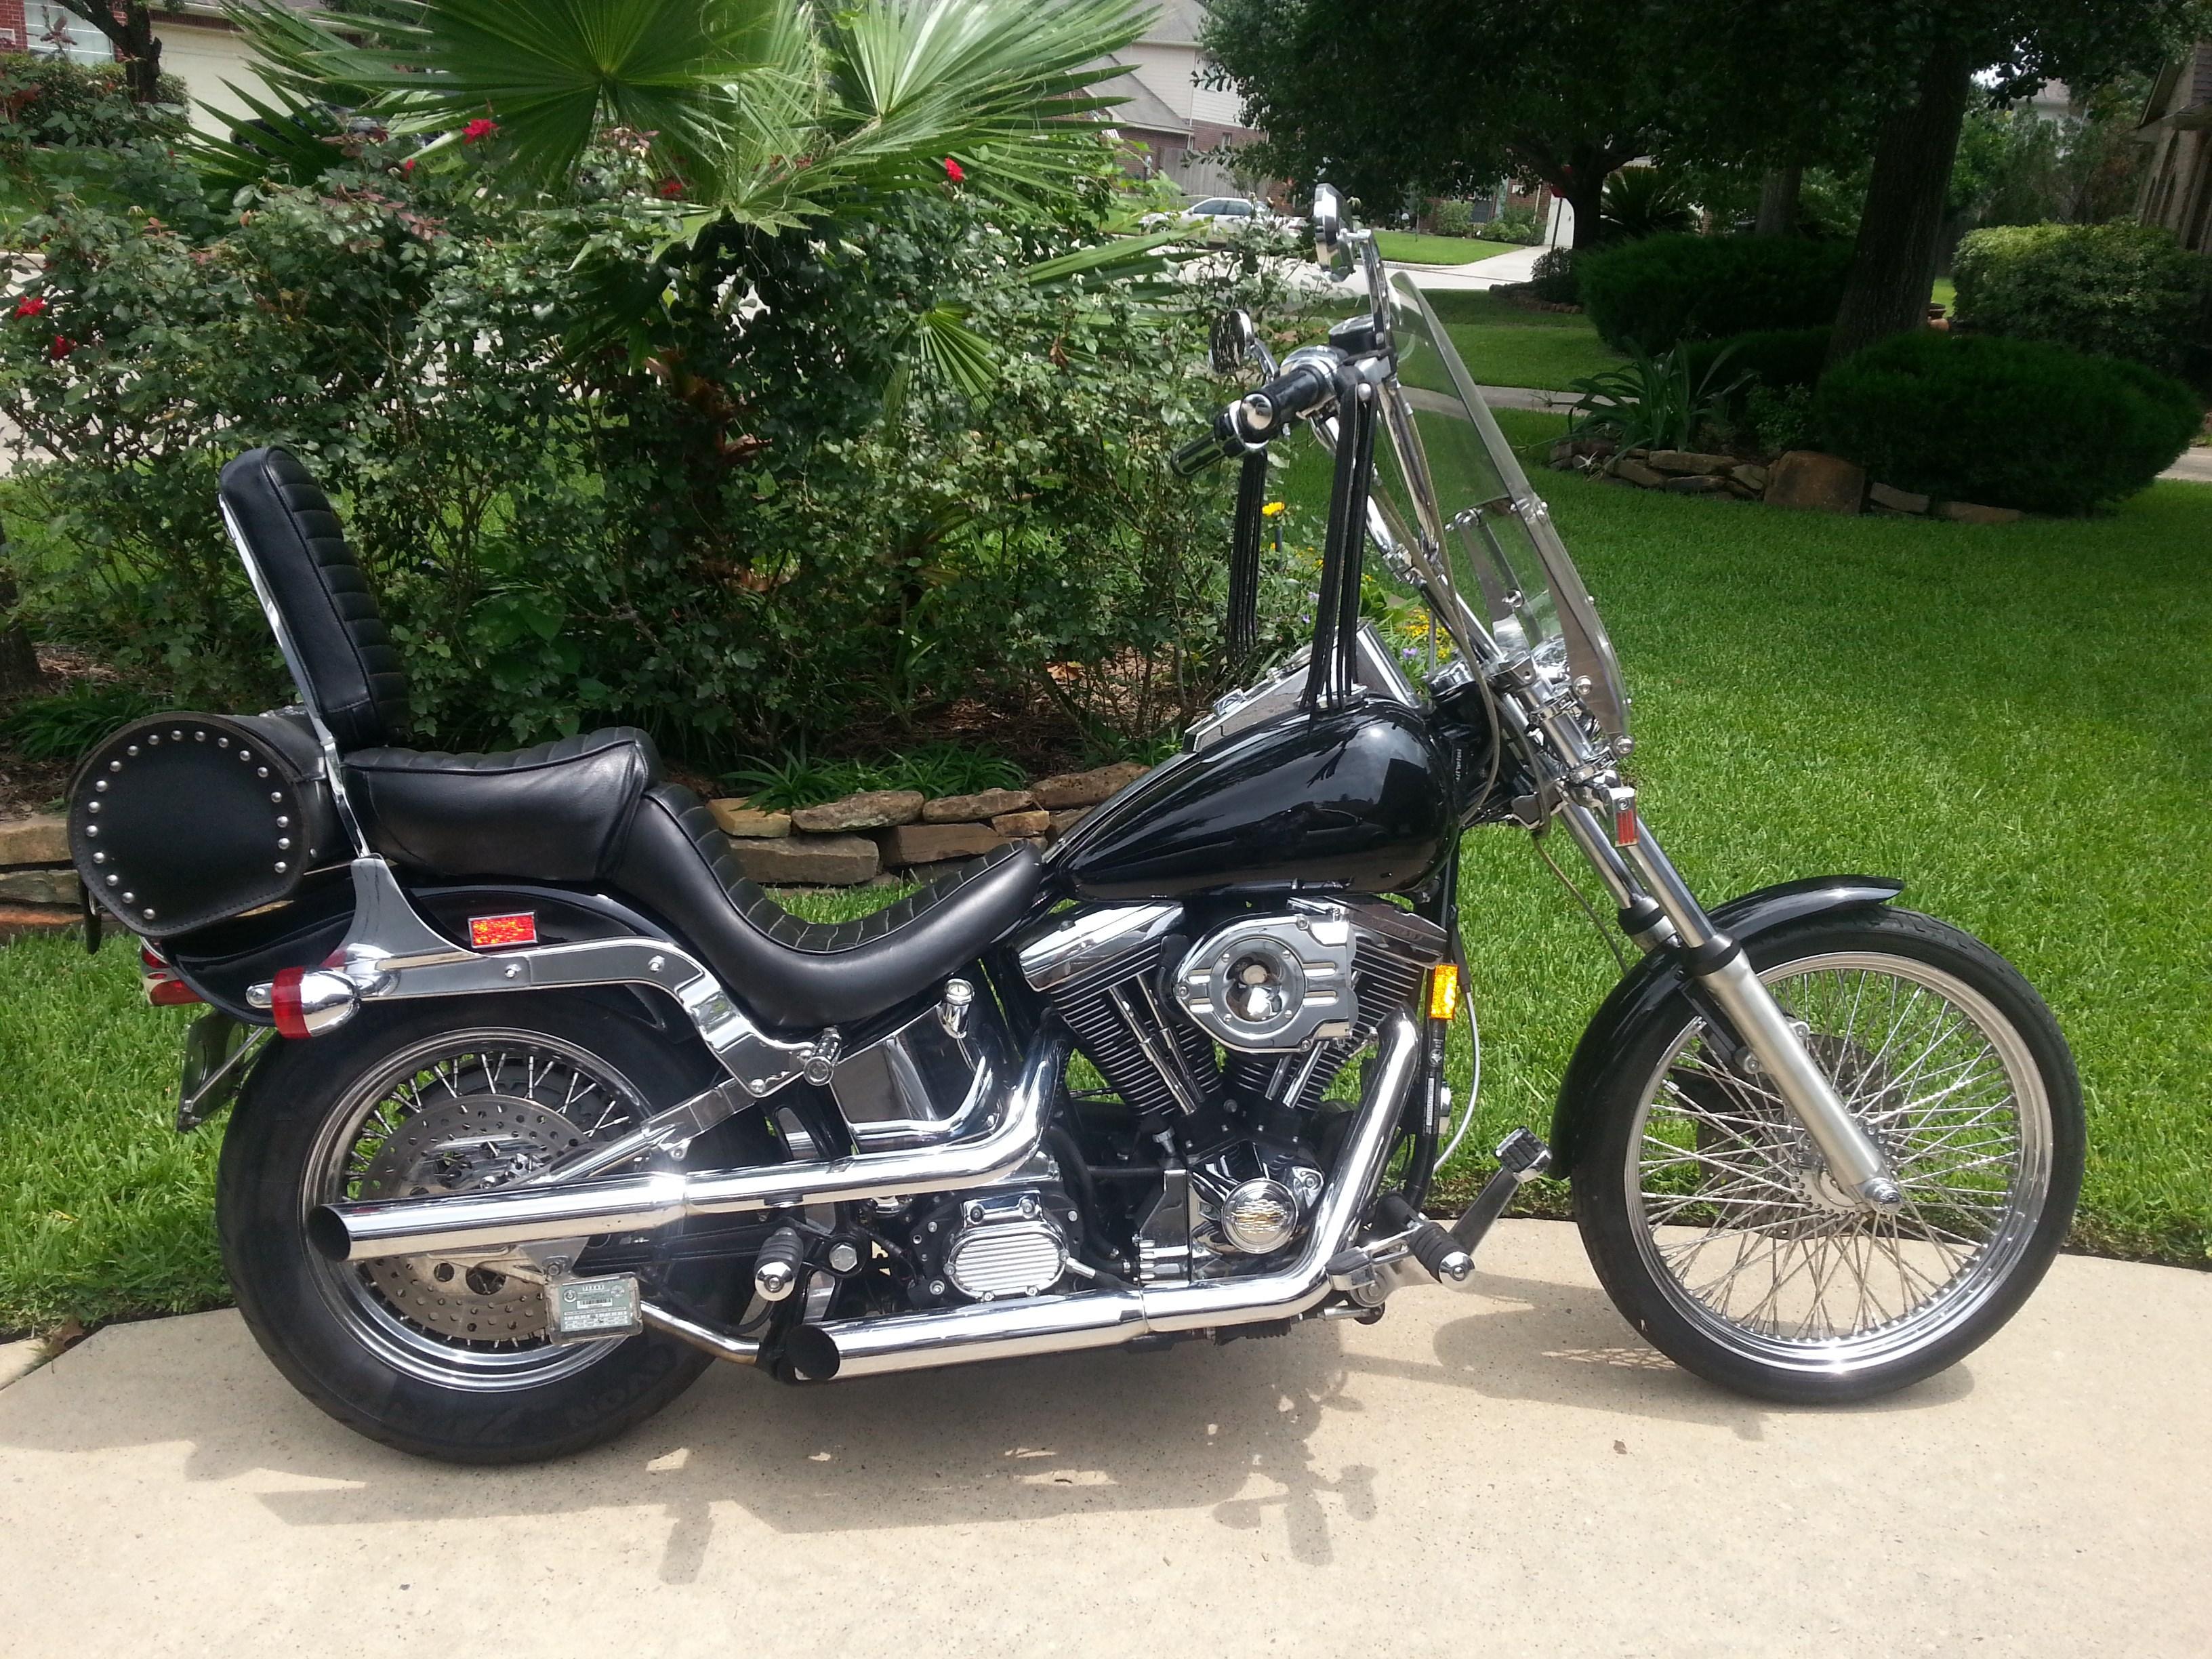 1997 Harley Davidson 174 Fxstc Softail 174 Custom Black